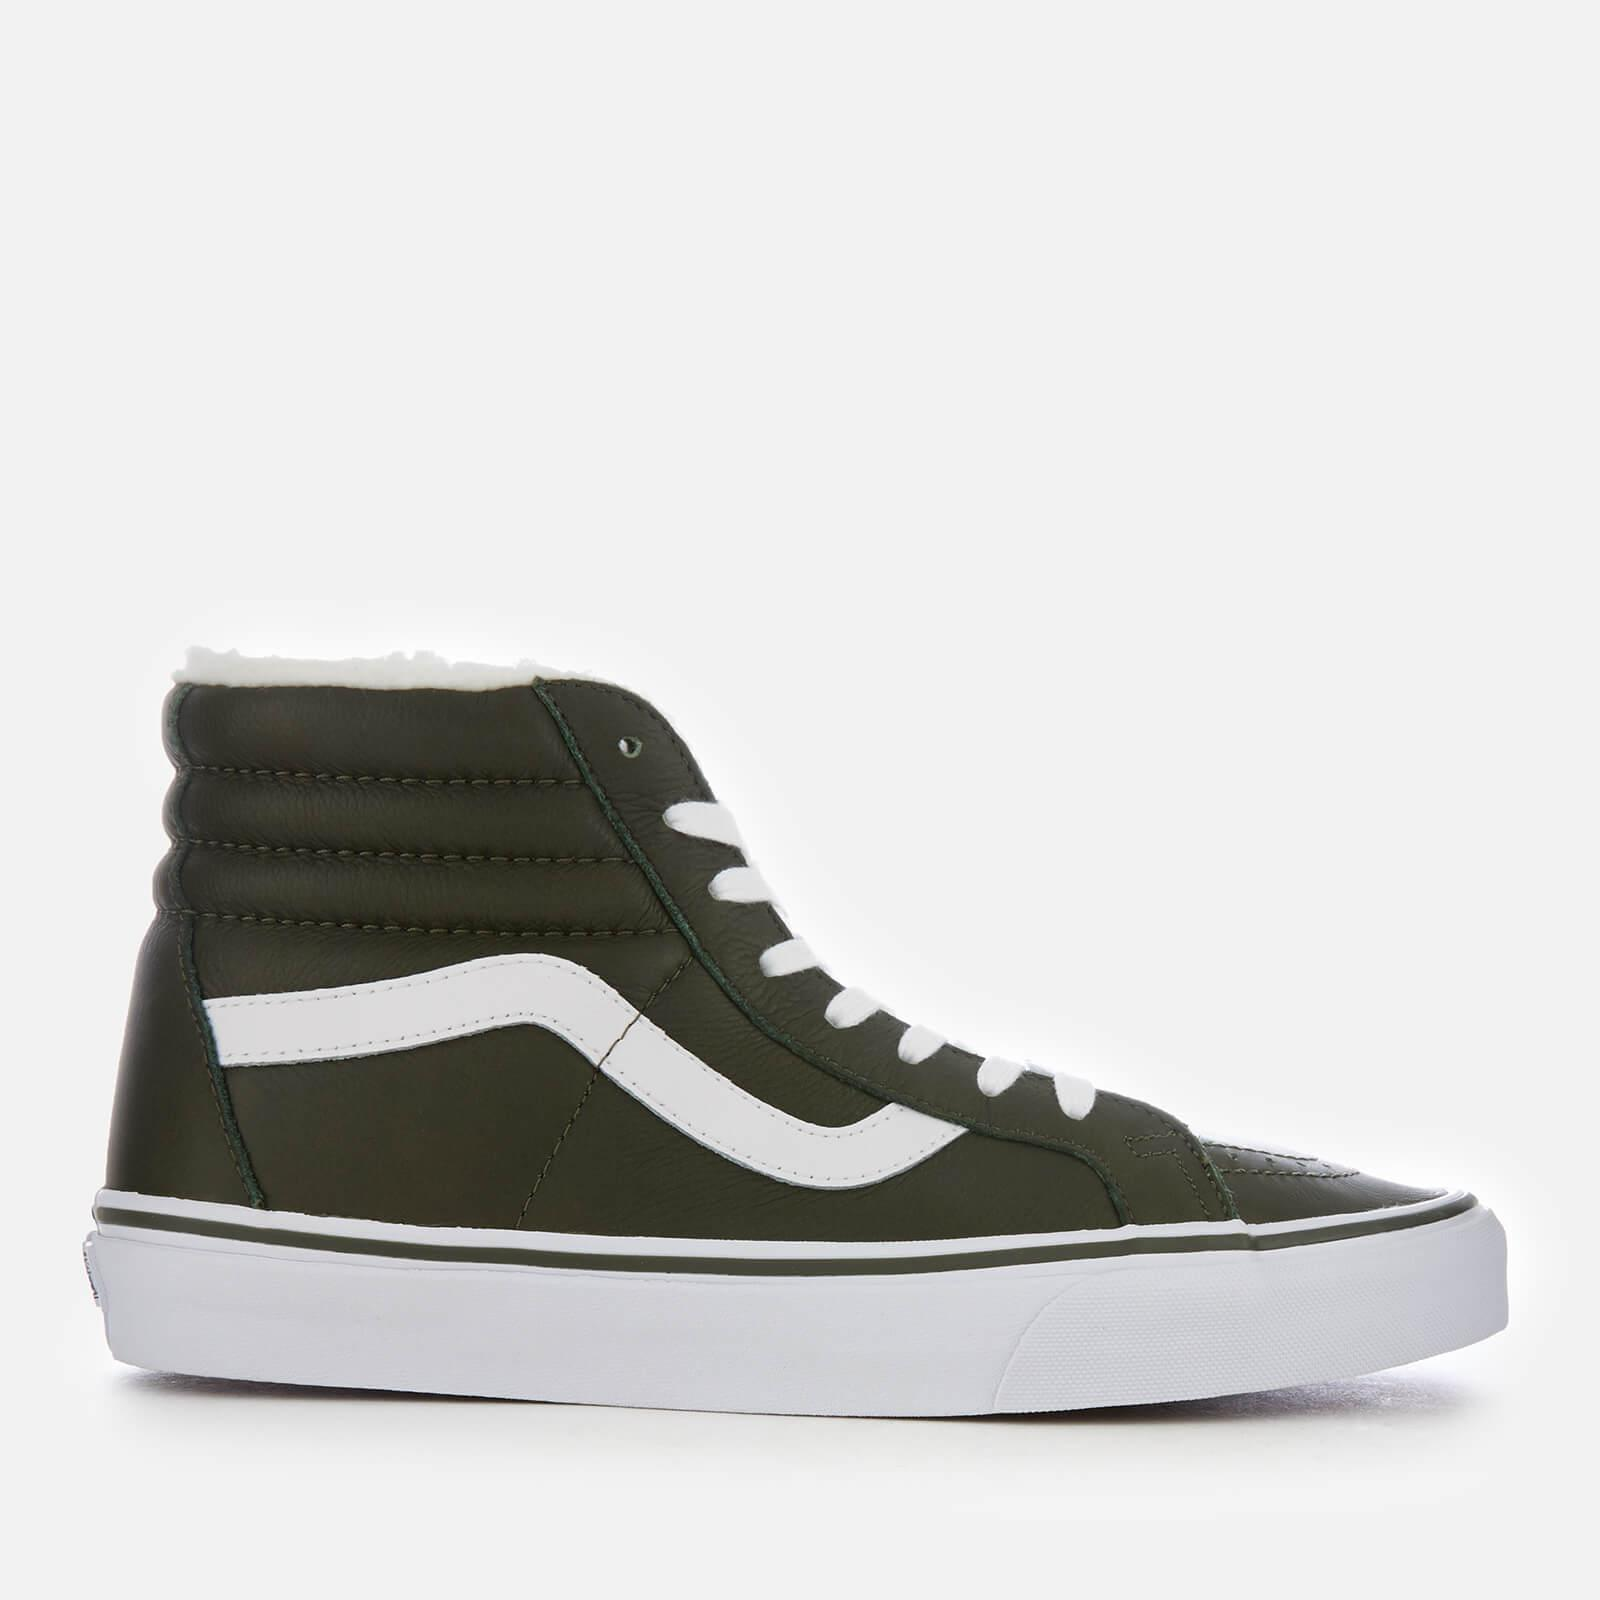 b1846080d4 Vans Sk8-hi Reissue Leather fleece Trainers in Green for Men - Save ...